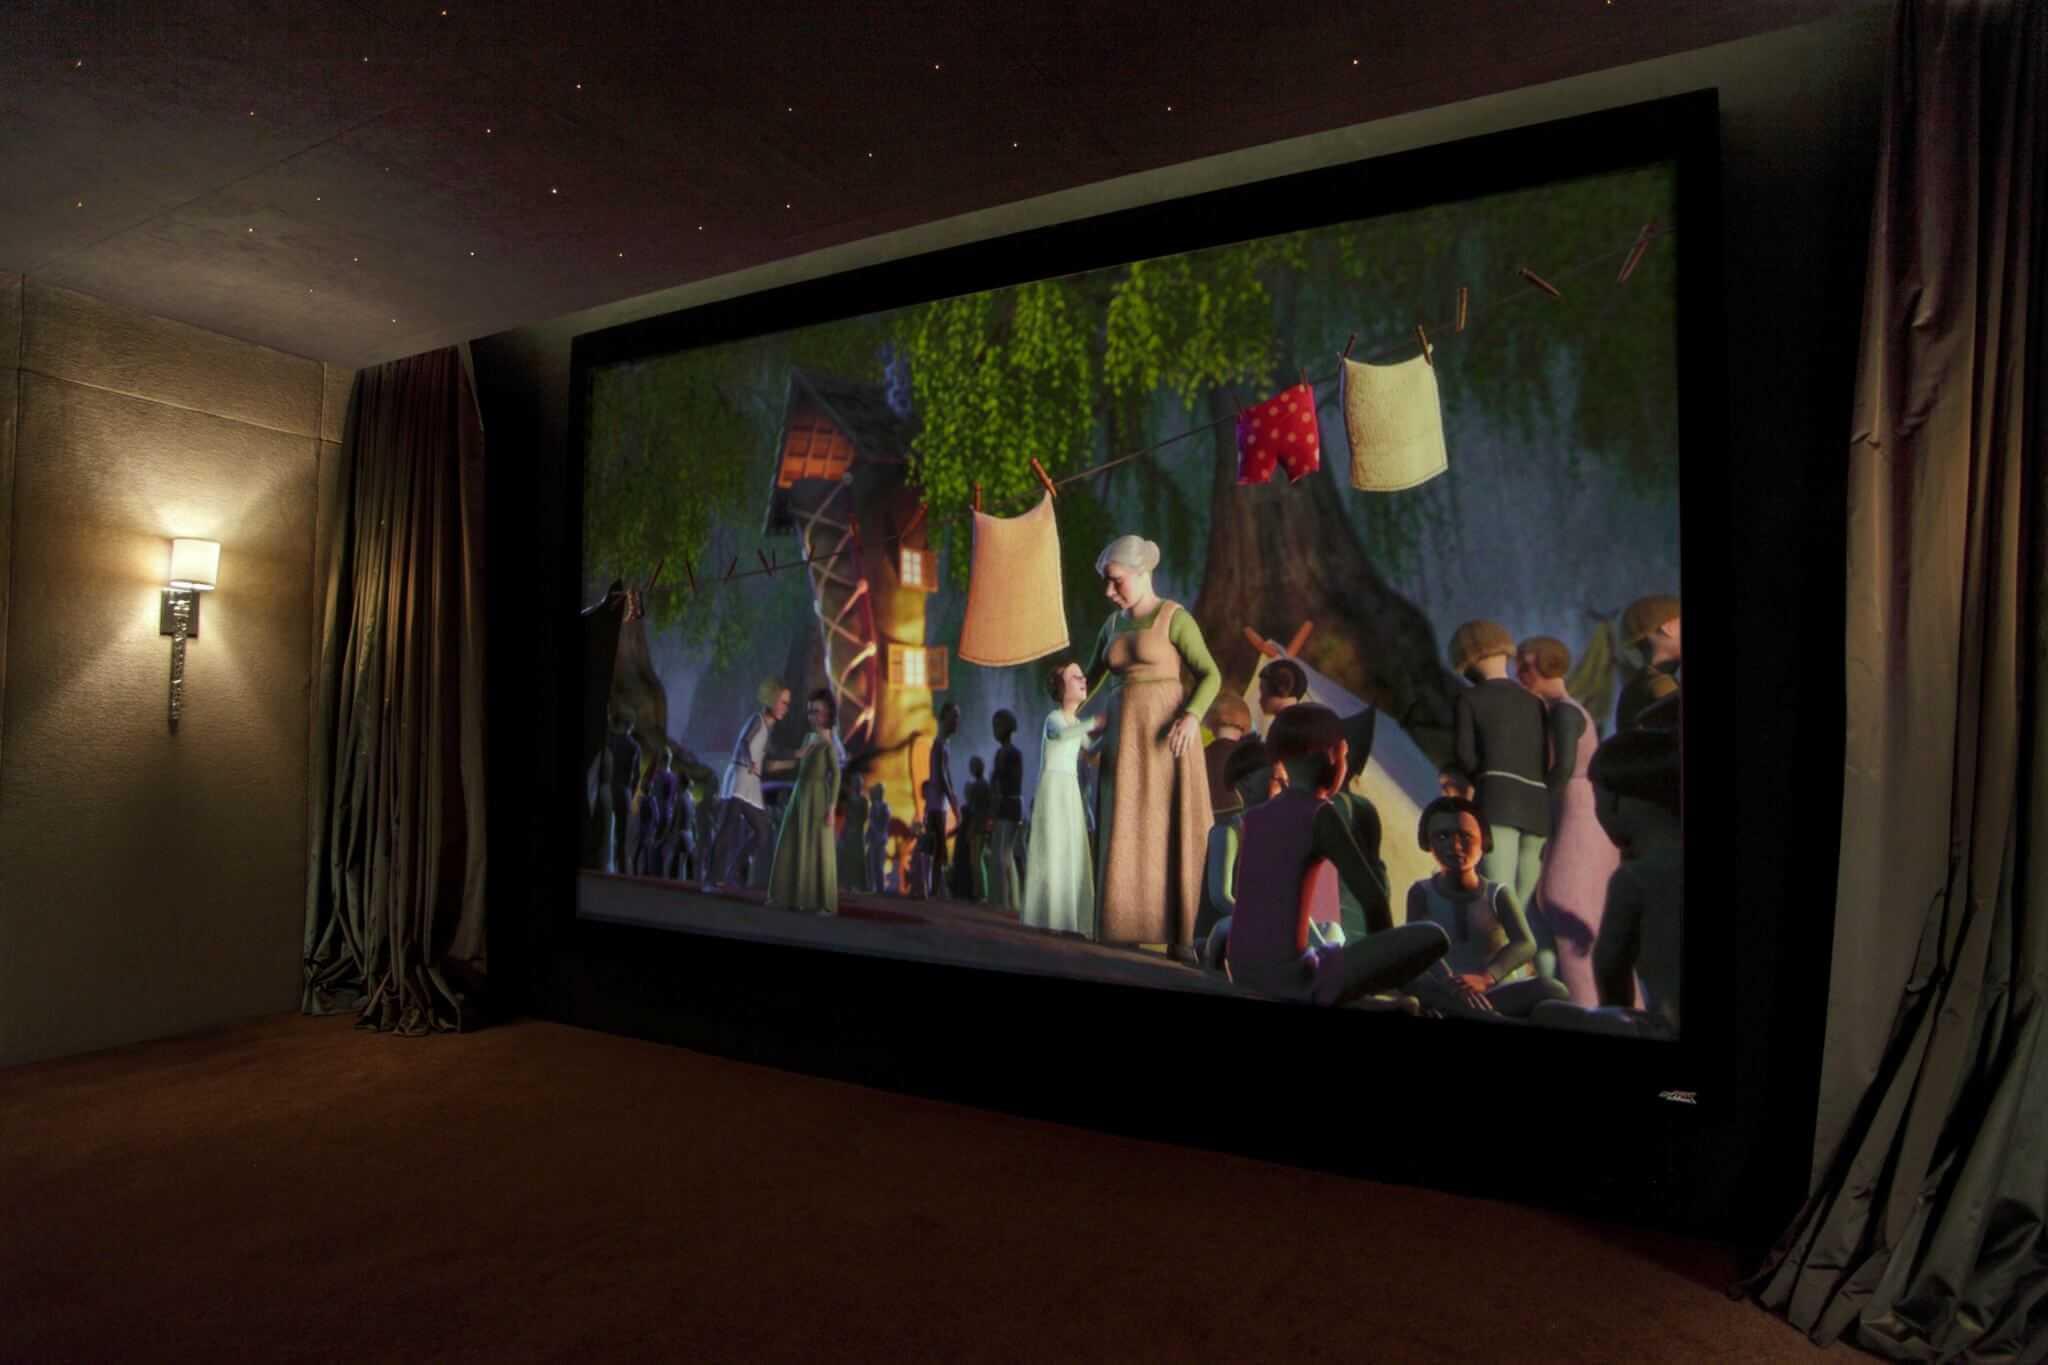 Huge Cinema Screen Installed in Dubai